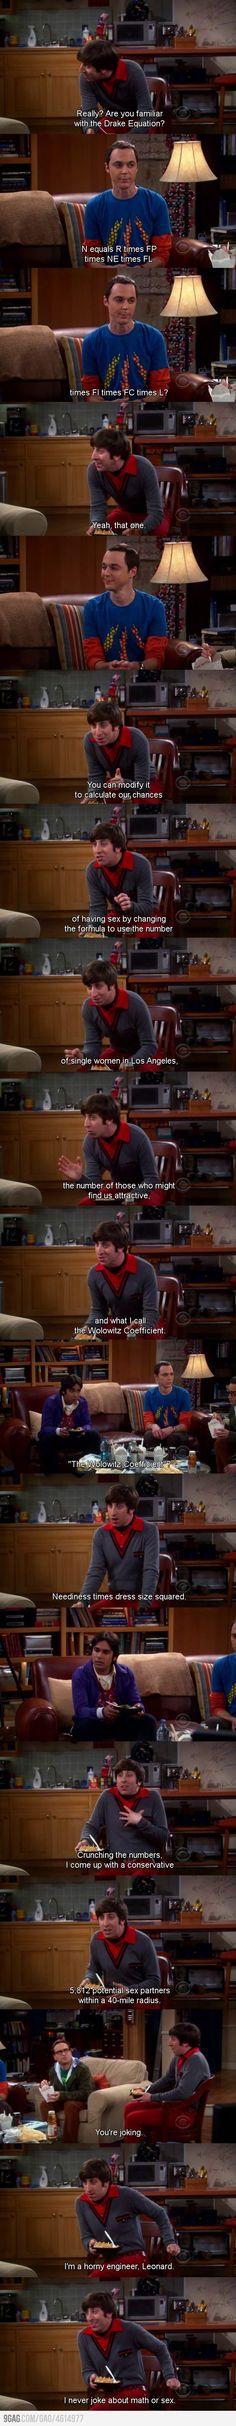 "The Big Bang Theory -  Howard Wolowitz ""Just a horny engineer"""